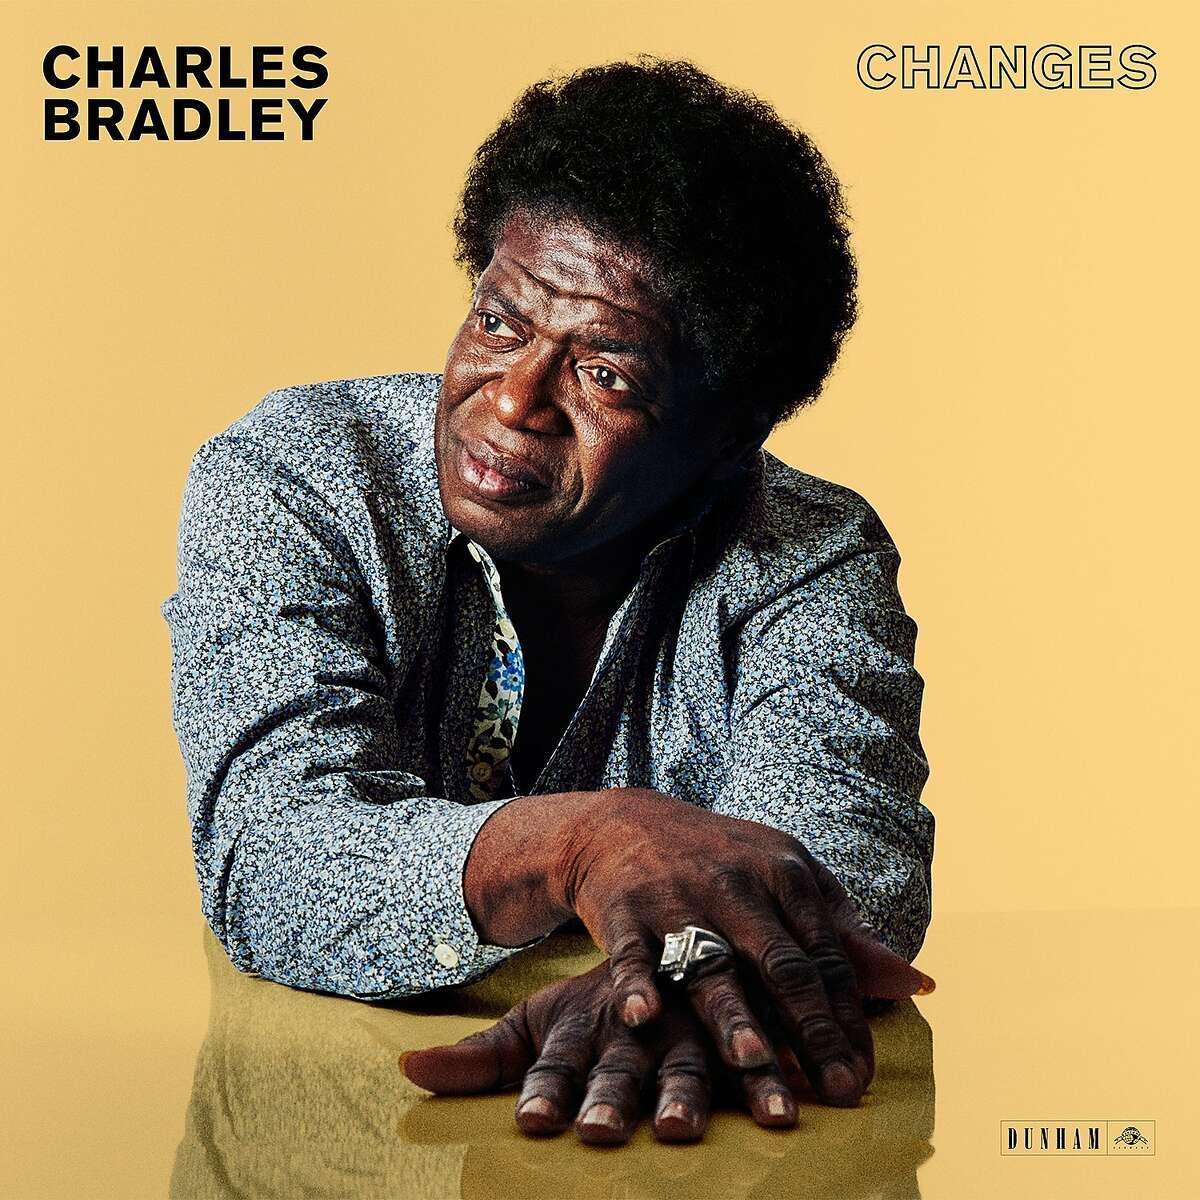 Charles Bradley's third studio album is 'Changes.'